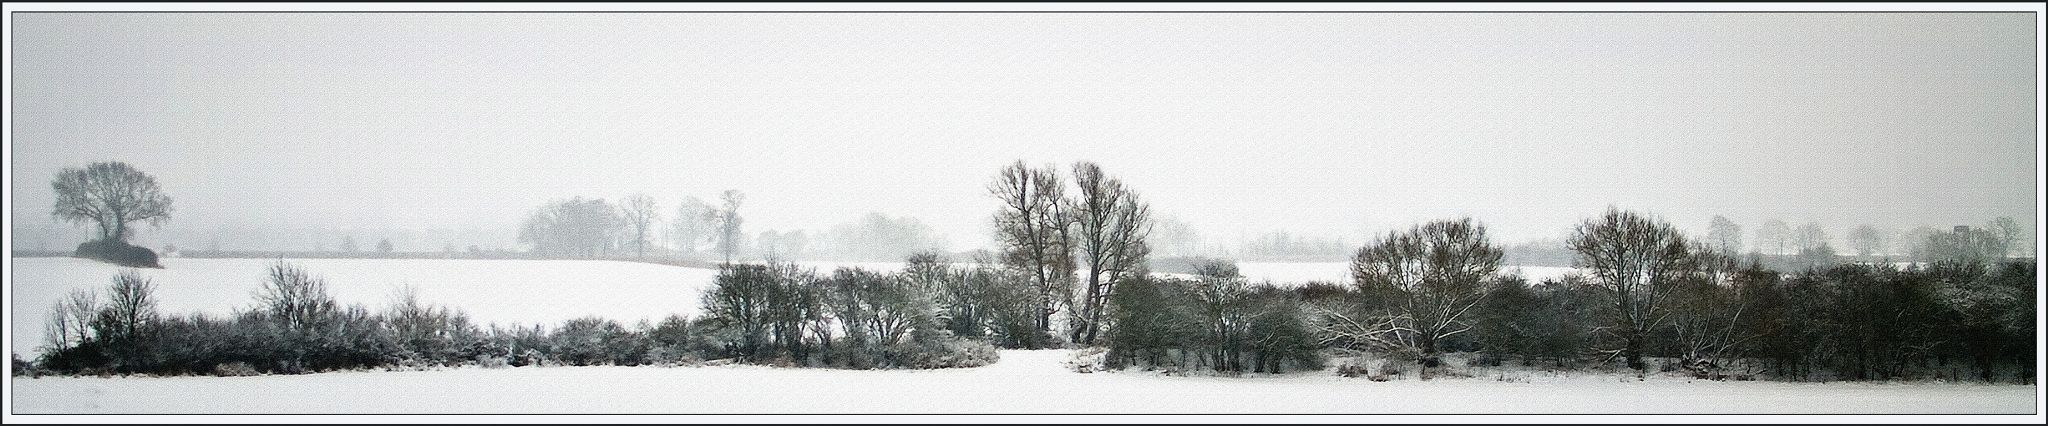 Wide snow by DavidNorfolk